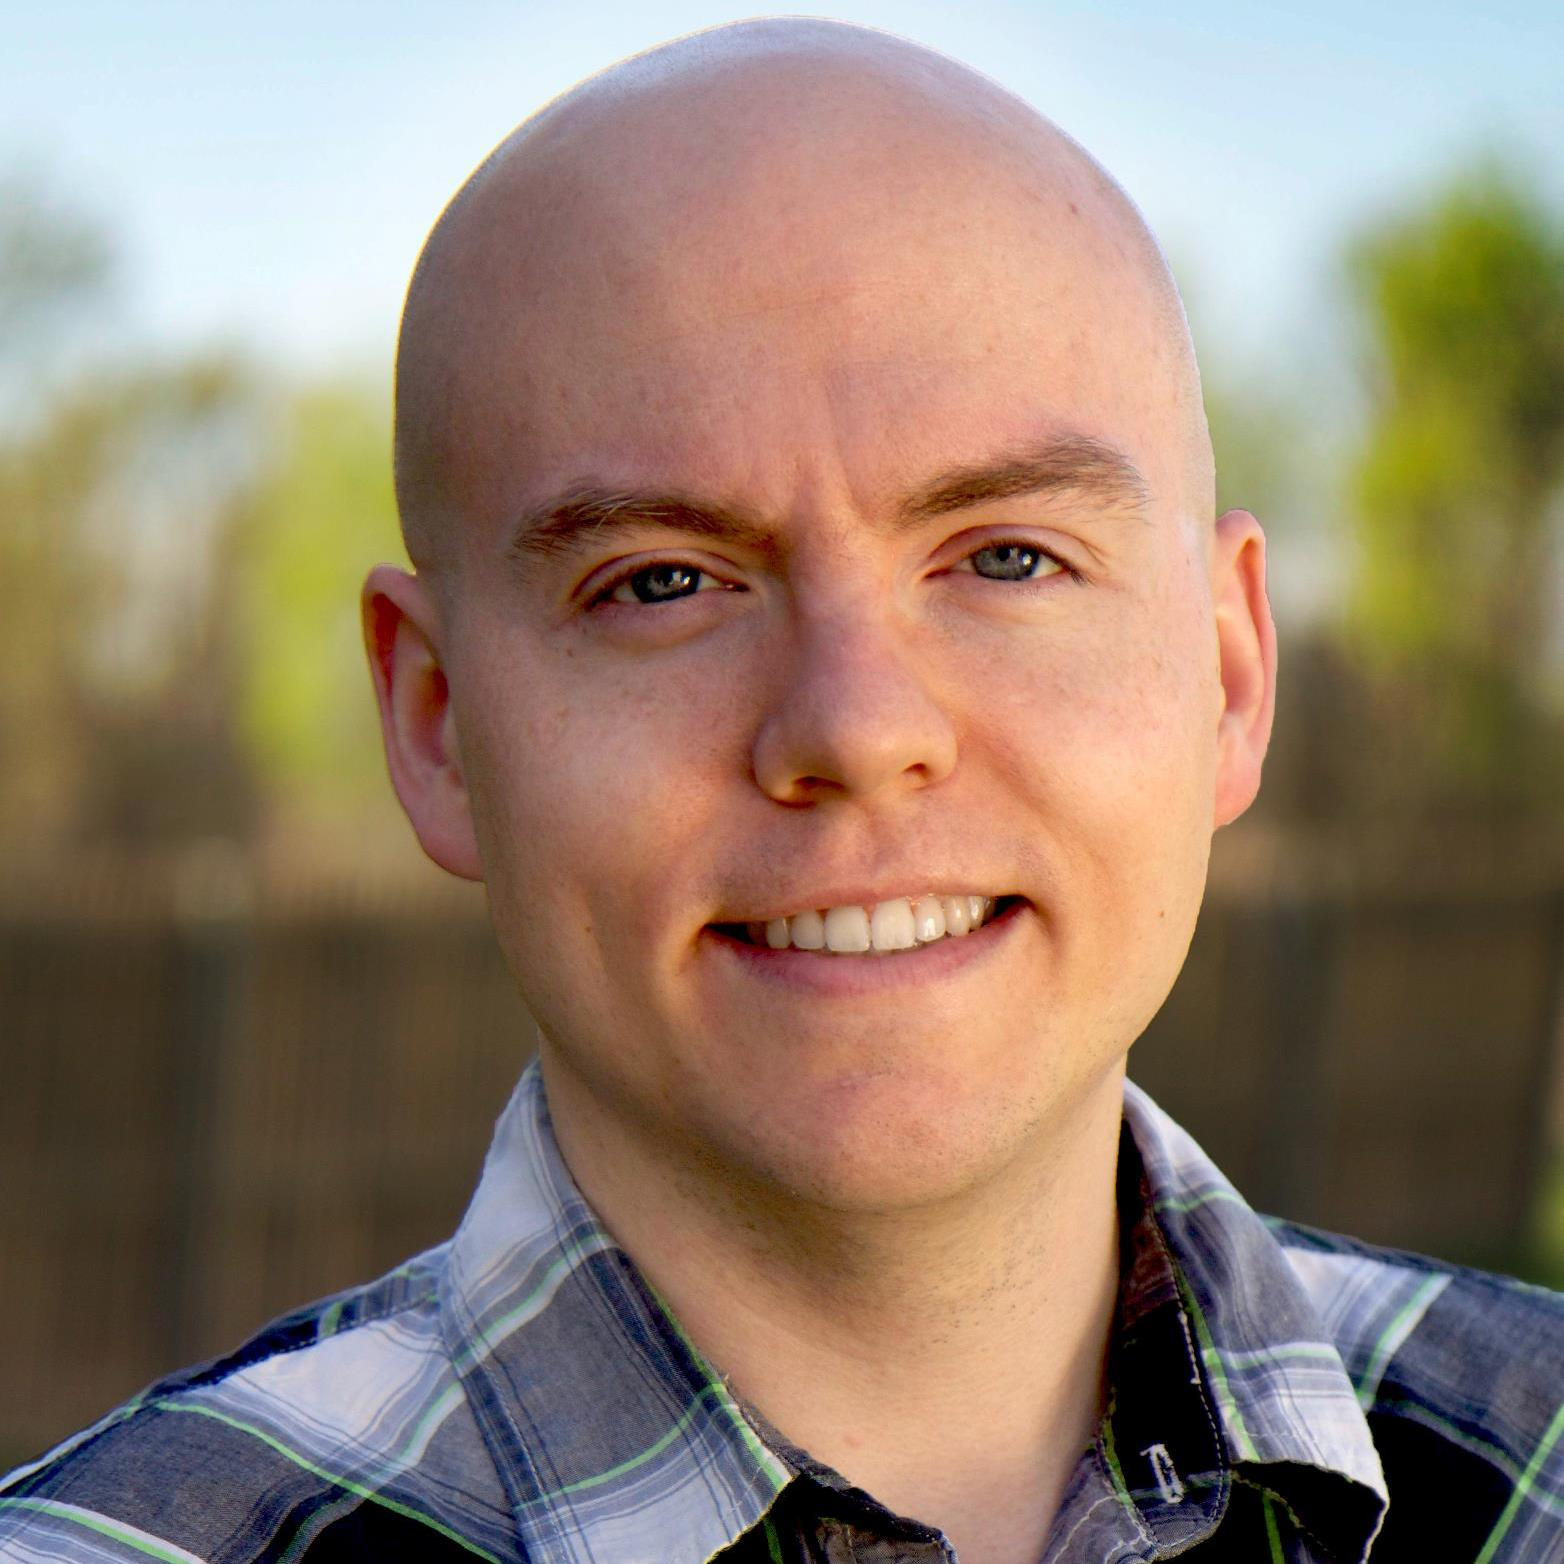 Executive Producer - Daniel Swinton